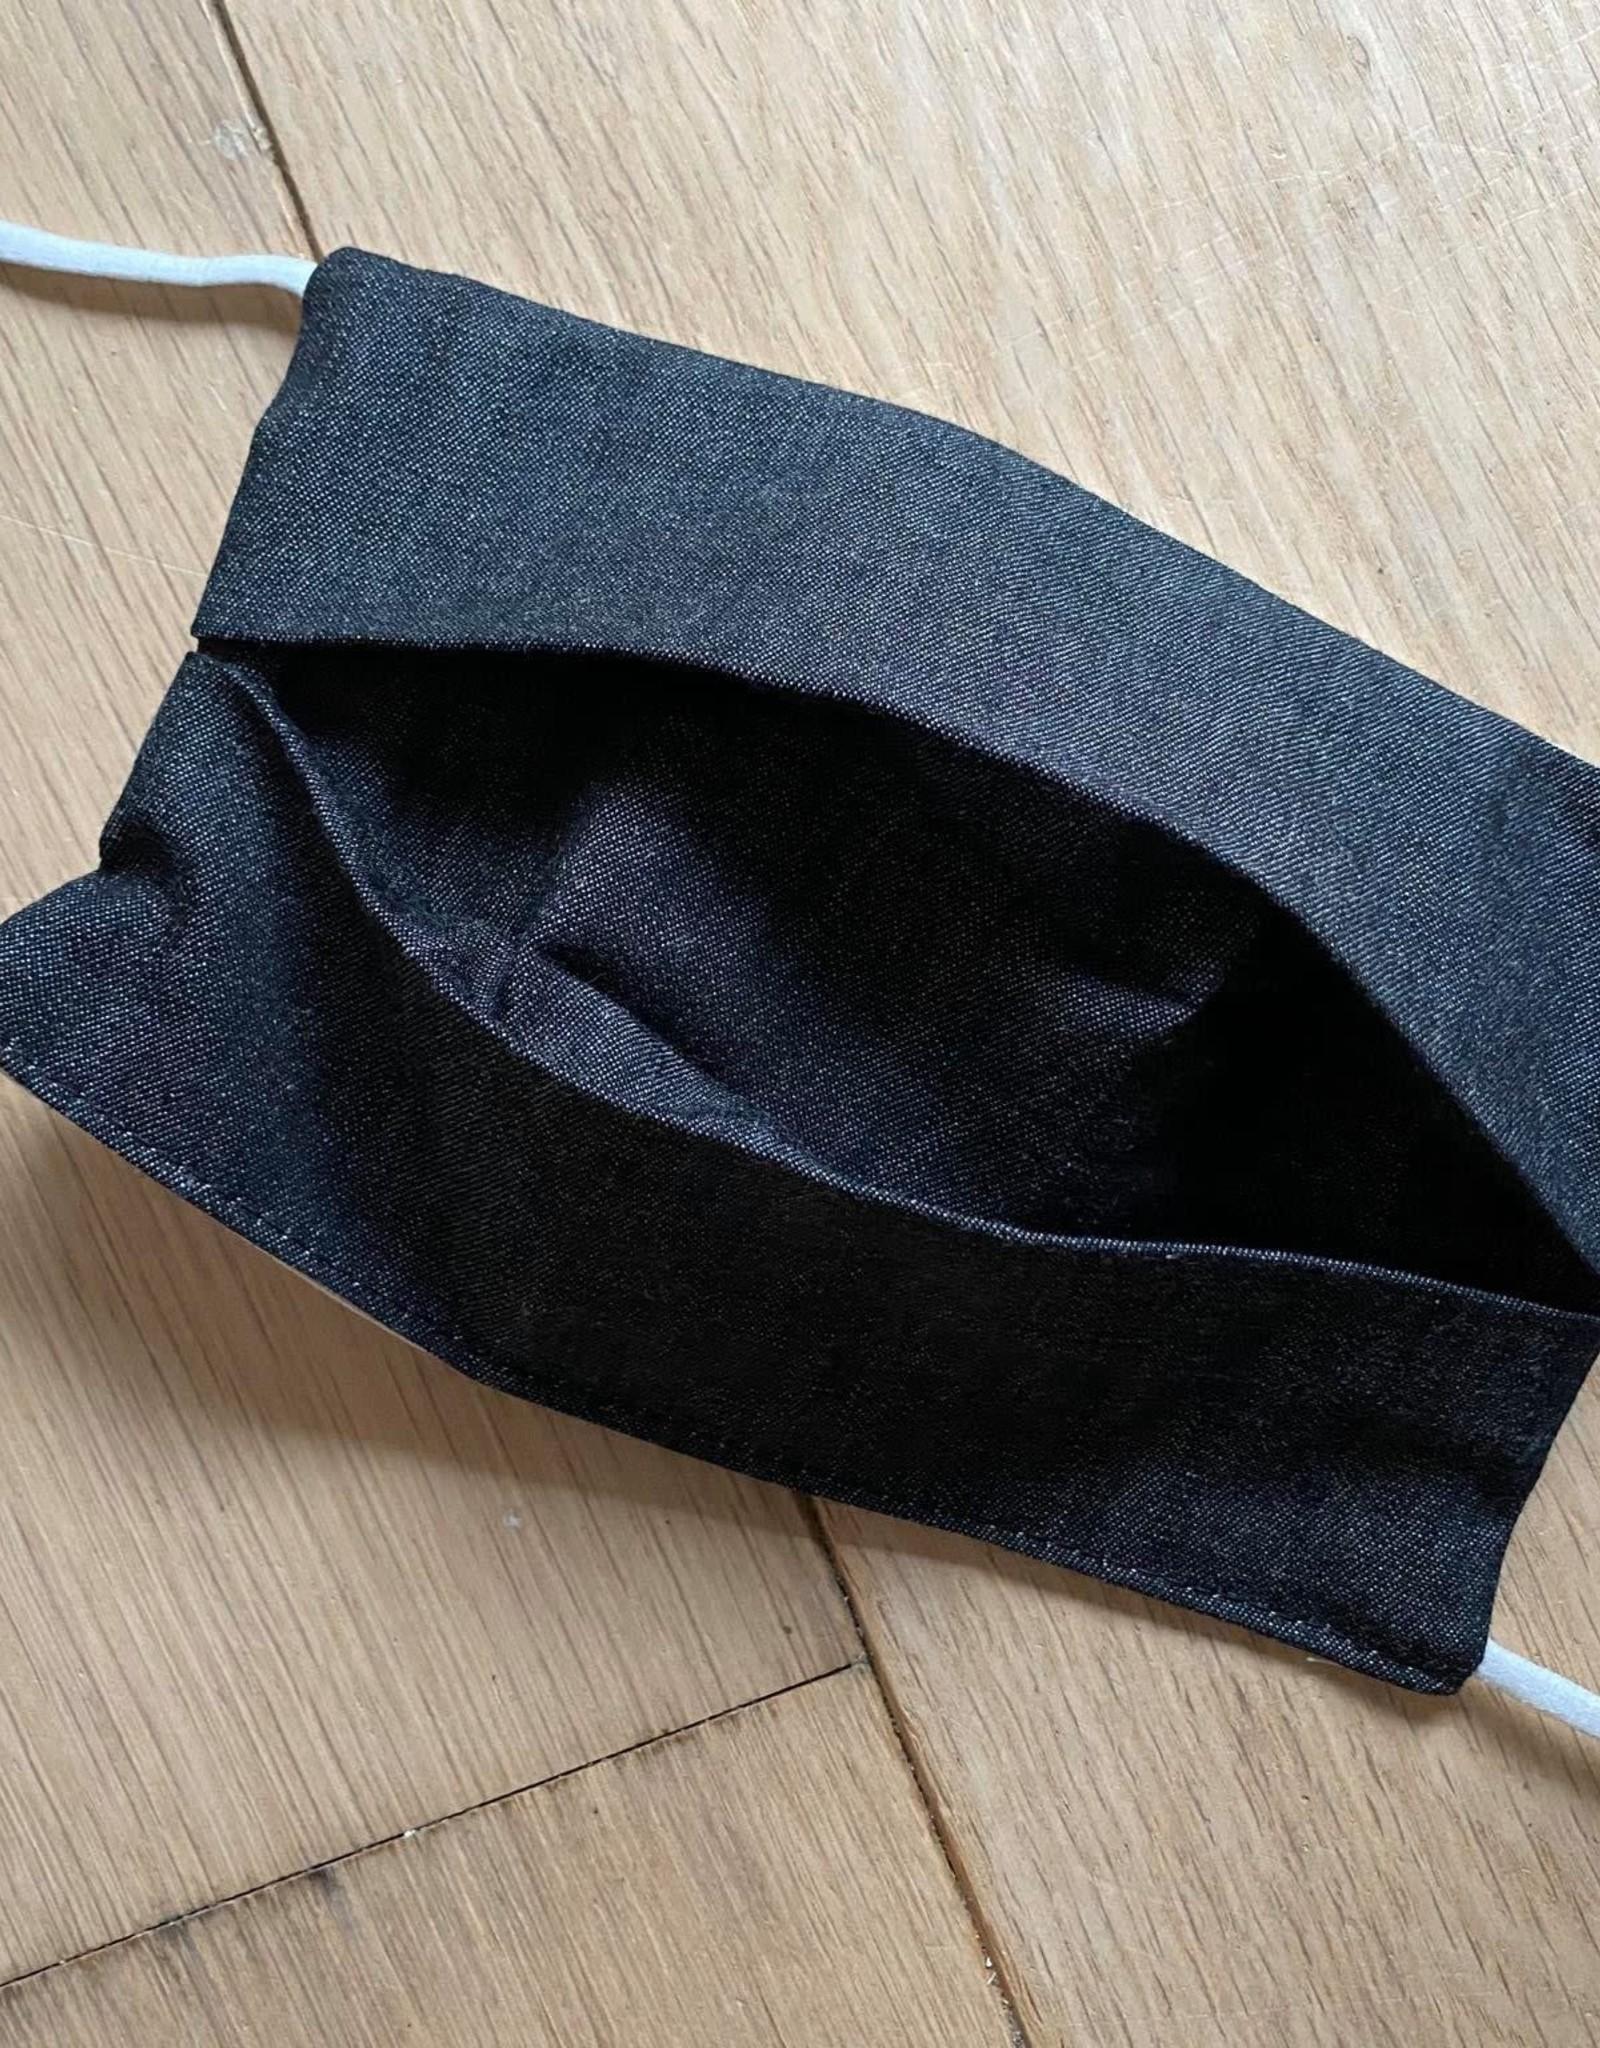 Mondmasker - Jeanslook Zwart - Enveloppe